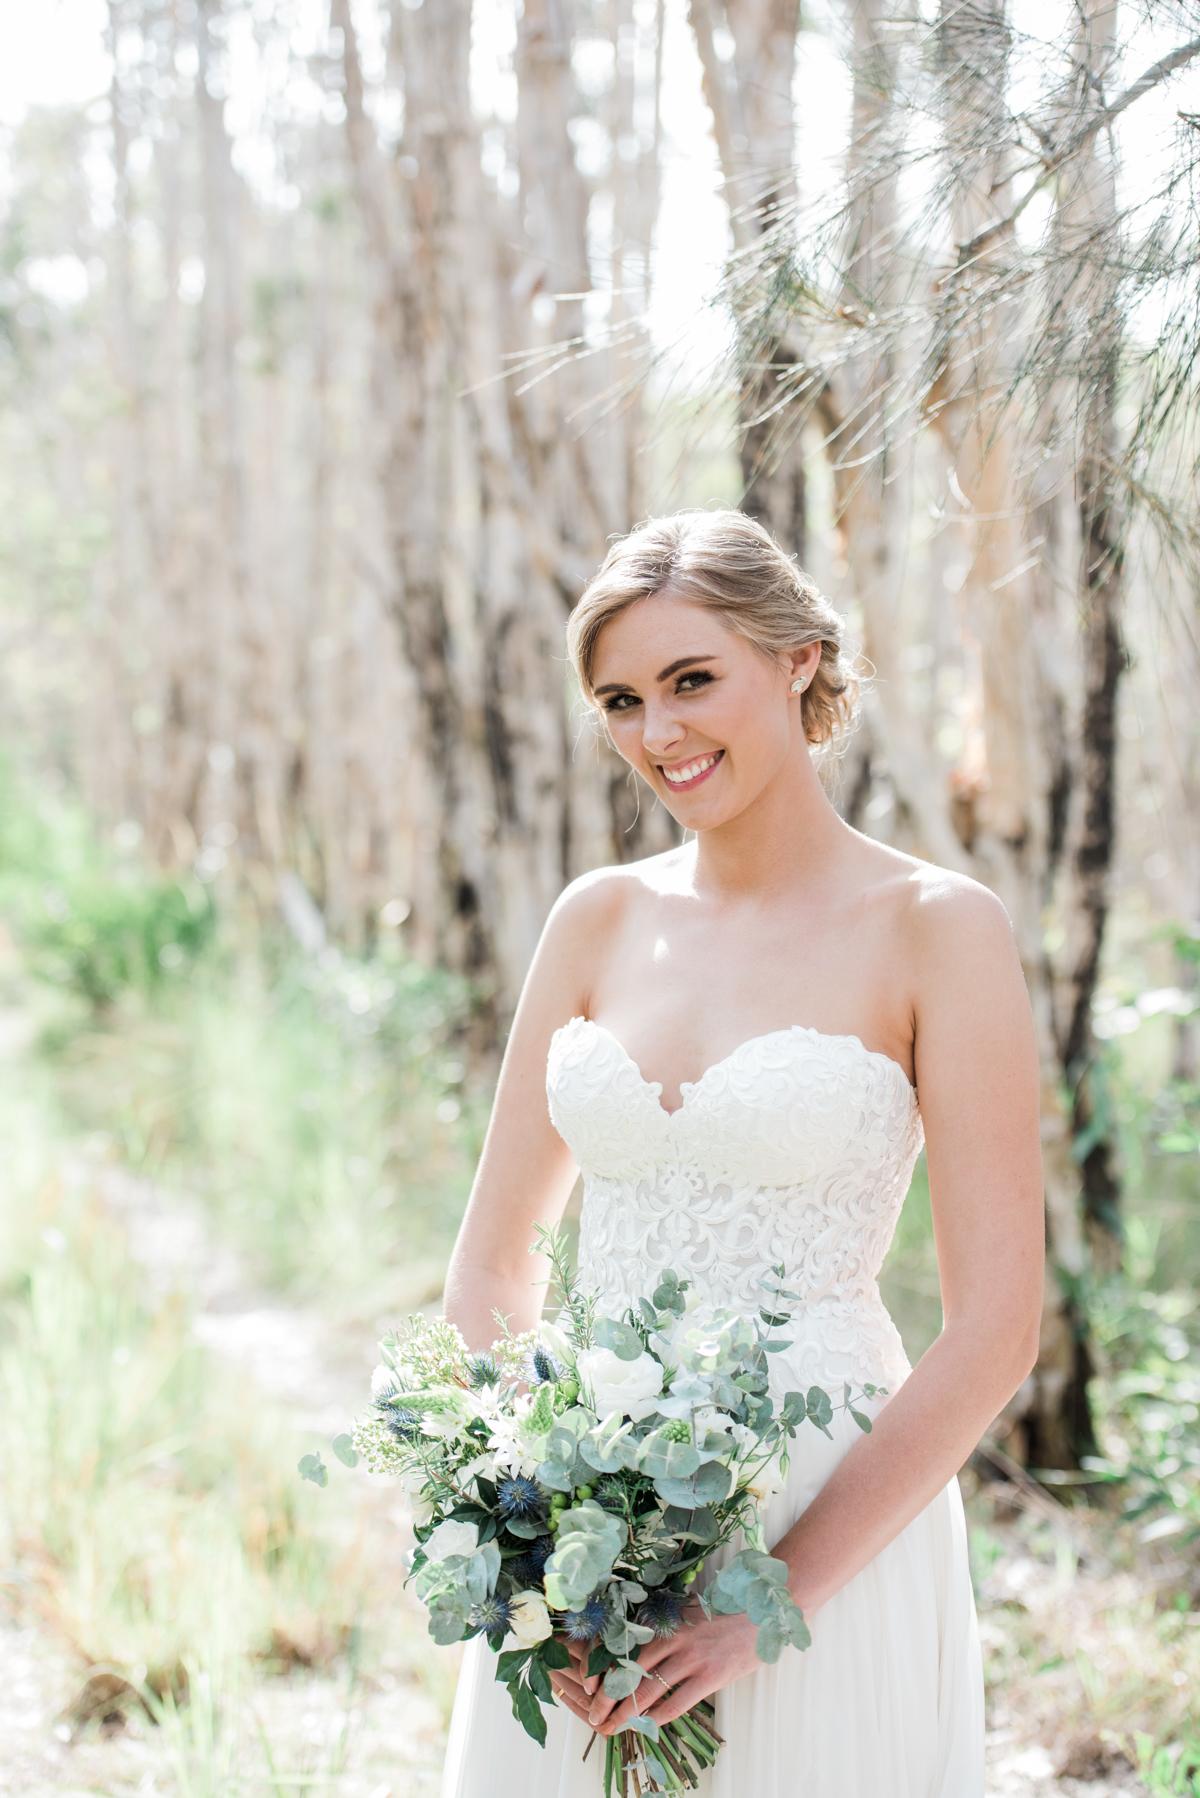 Cass and Josh- wedding photographer, byron bay wedding and family photographer, tweed heads wedding and family photography-459.jpg